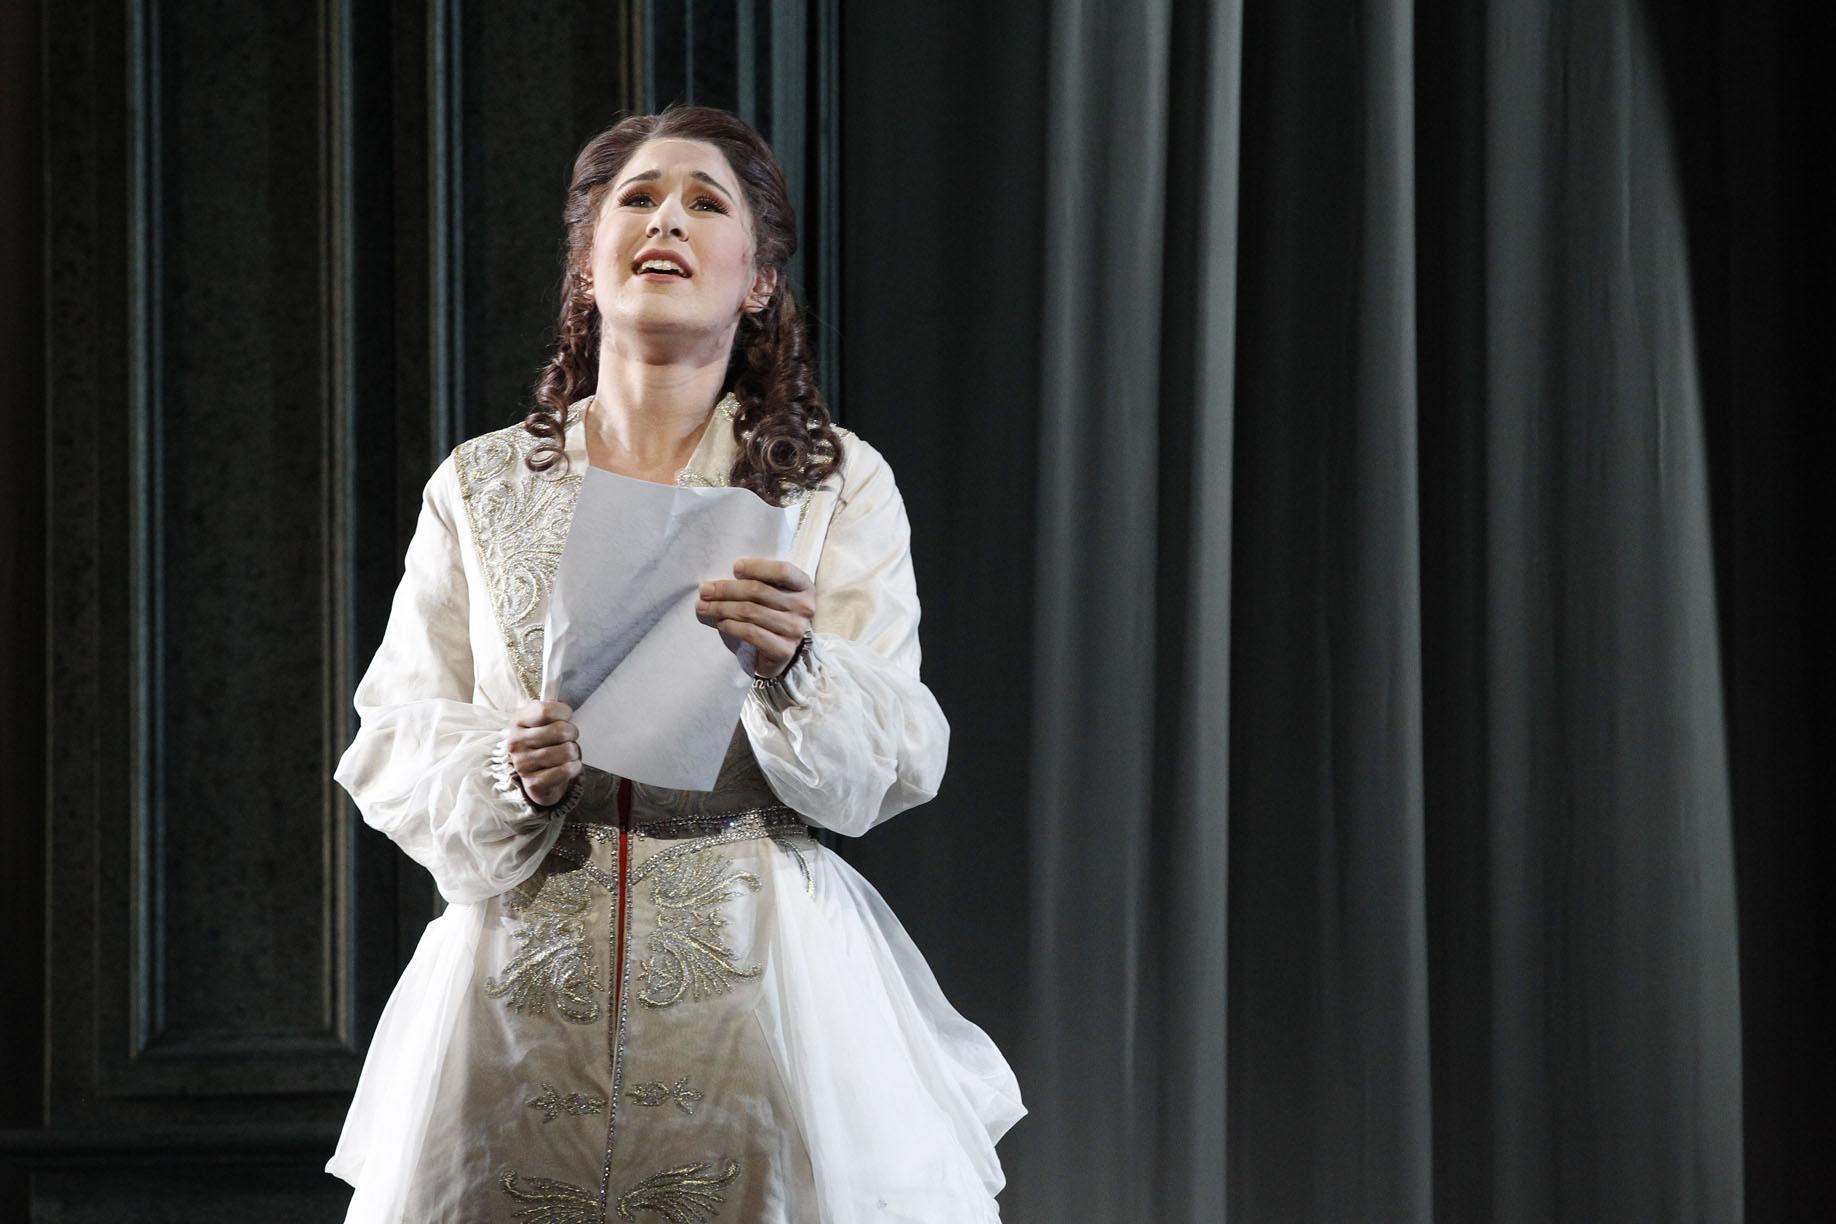 Eugene Onegin 2014 Opera Australia, Nicole Car as Tatyana, letter aria